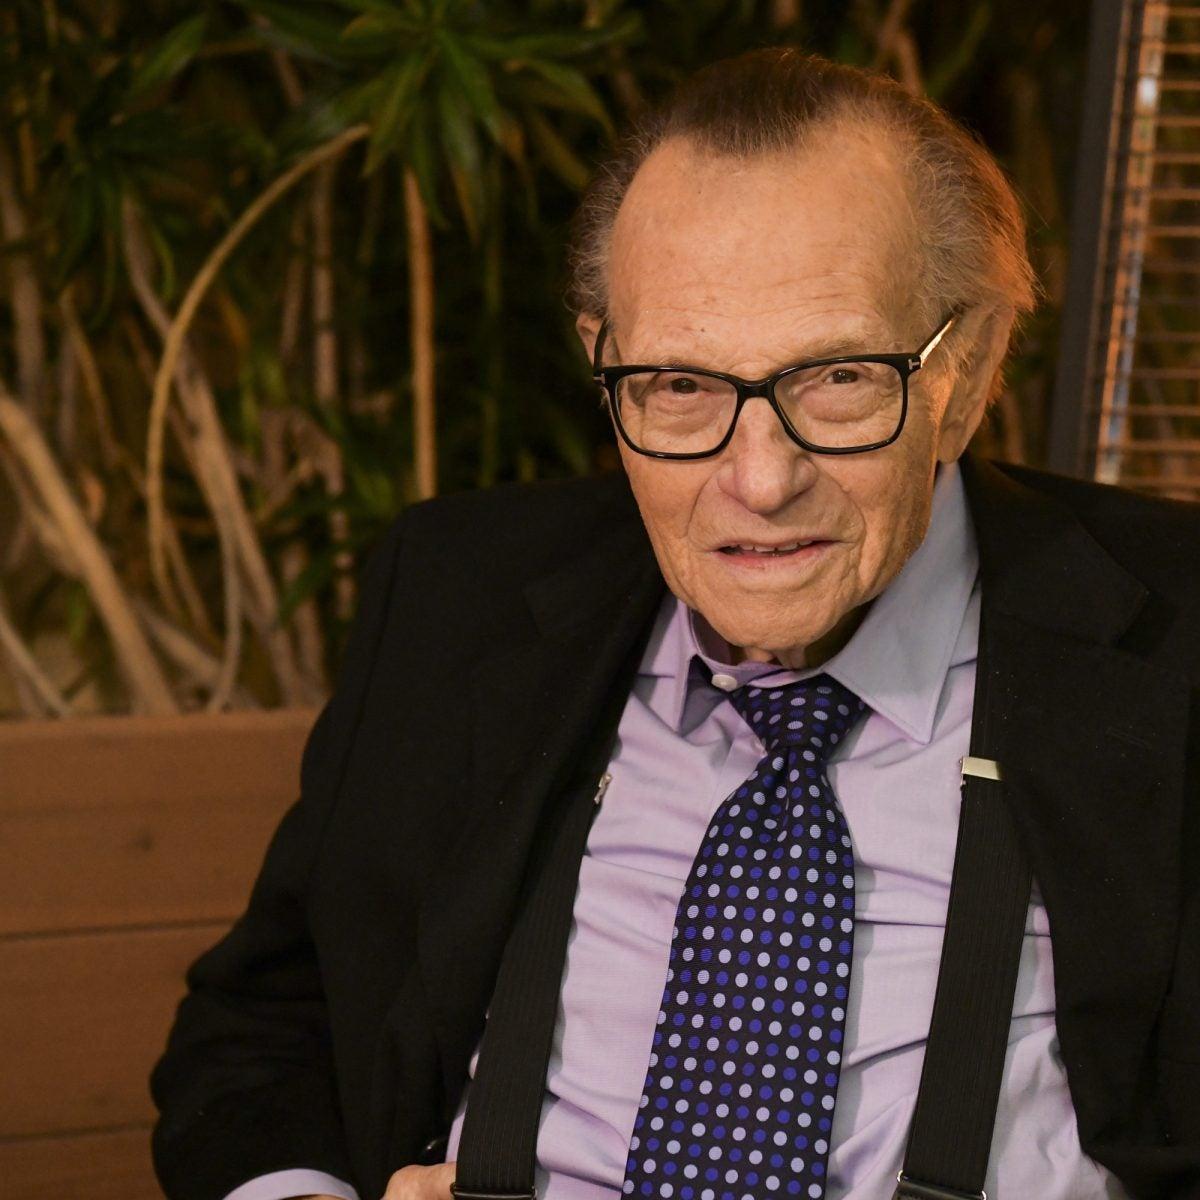 Remembering CNN Legend Larry King